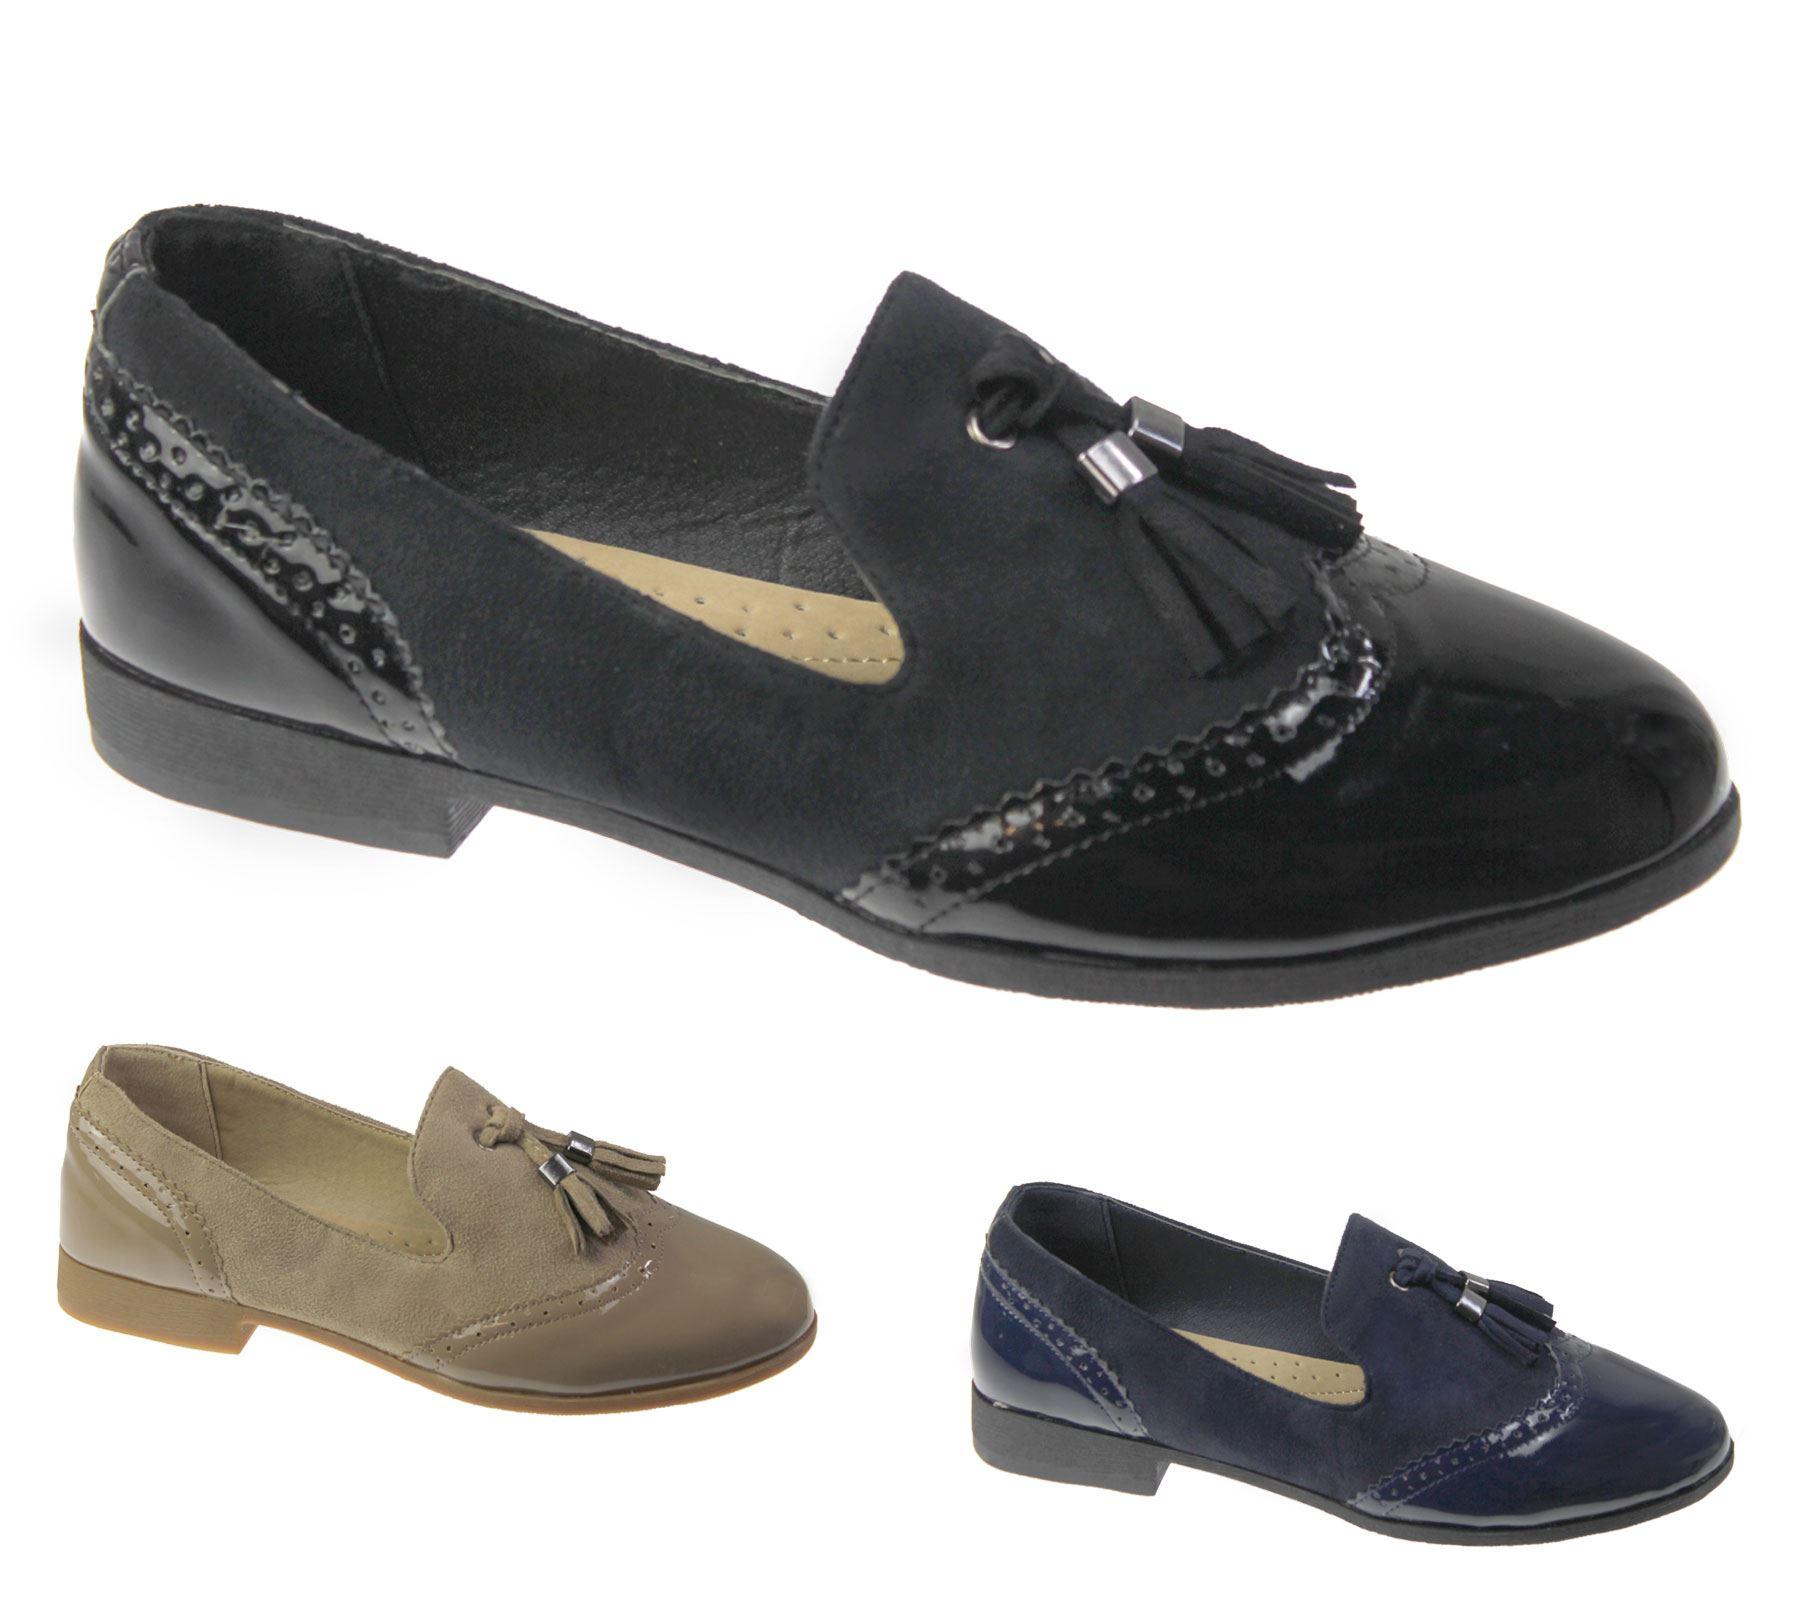 High Shine Black Shoes Mens Guide